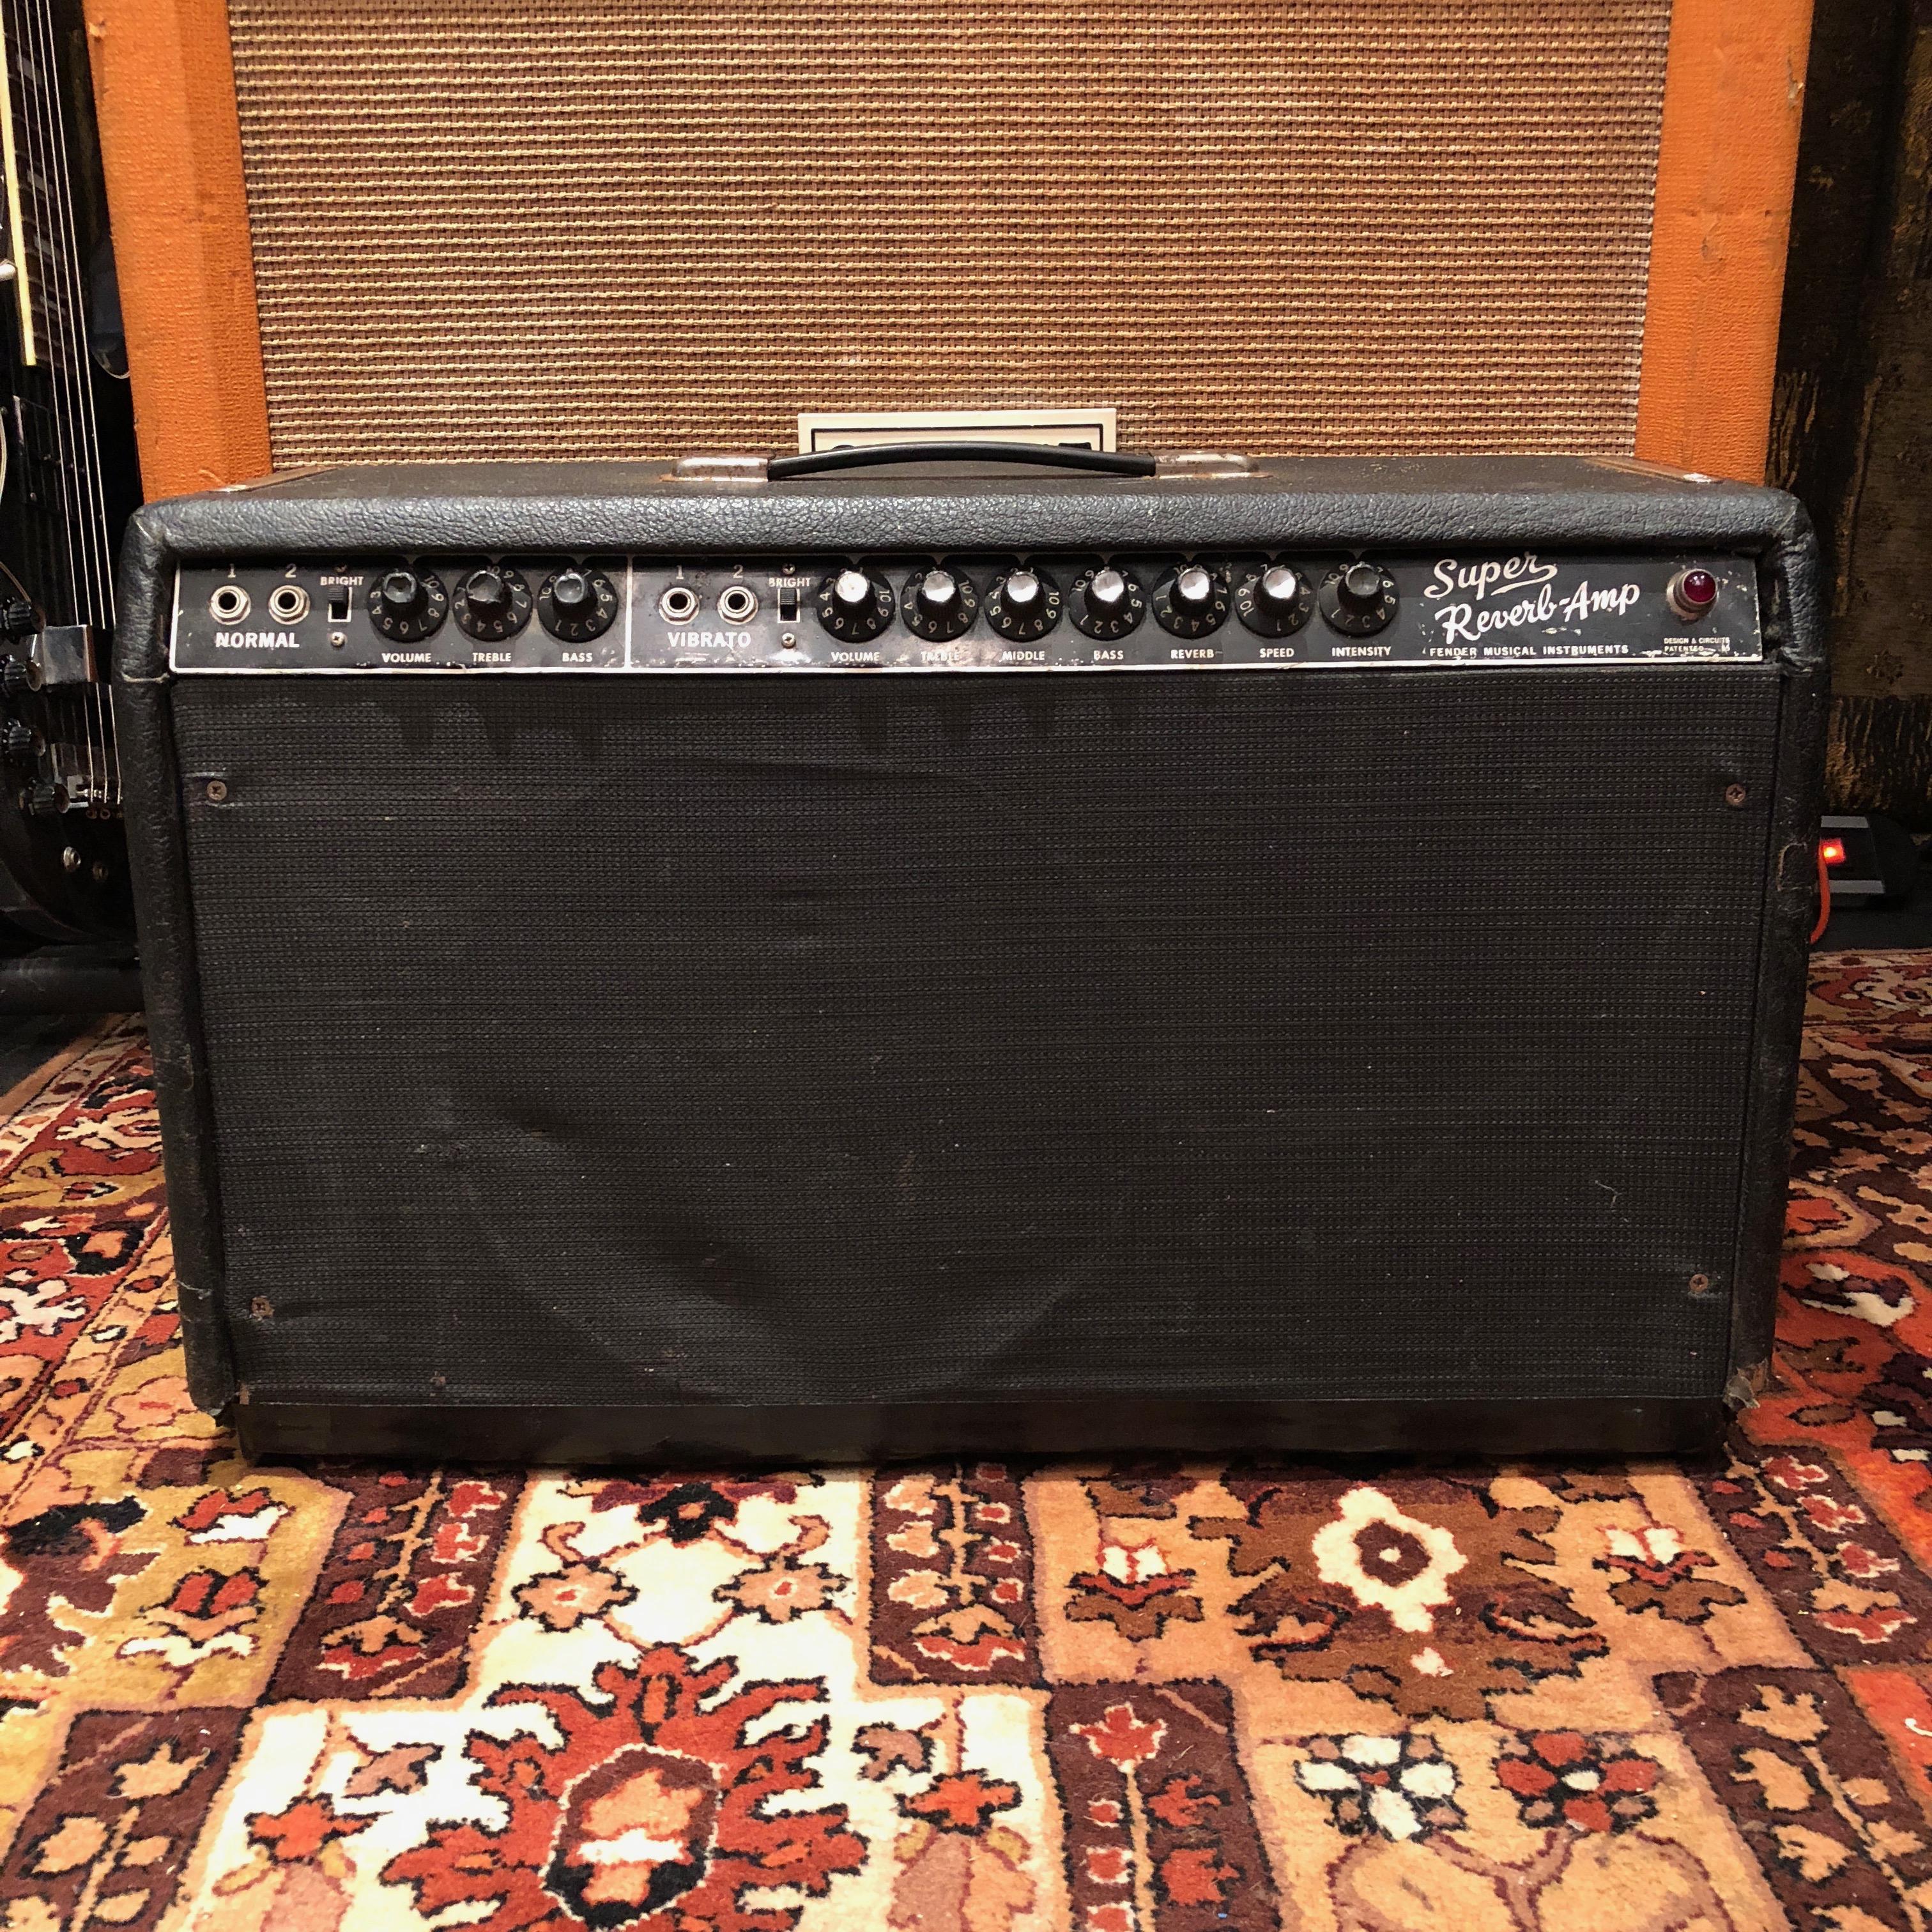 fender super reverb amp serial numbers